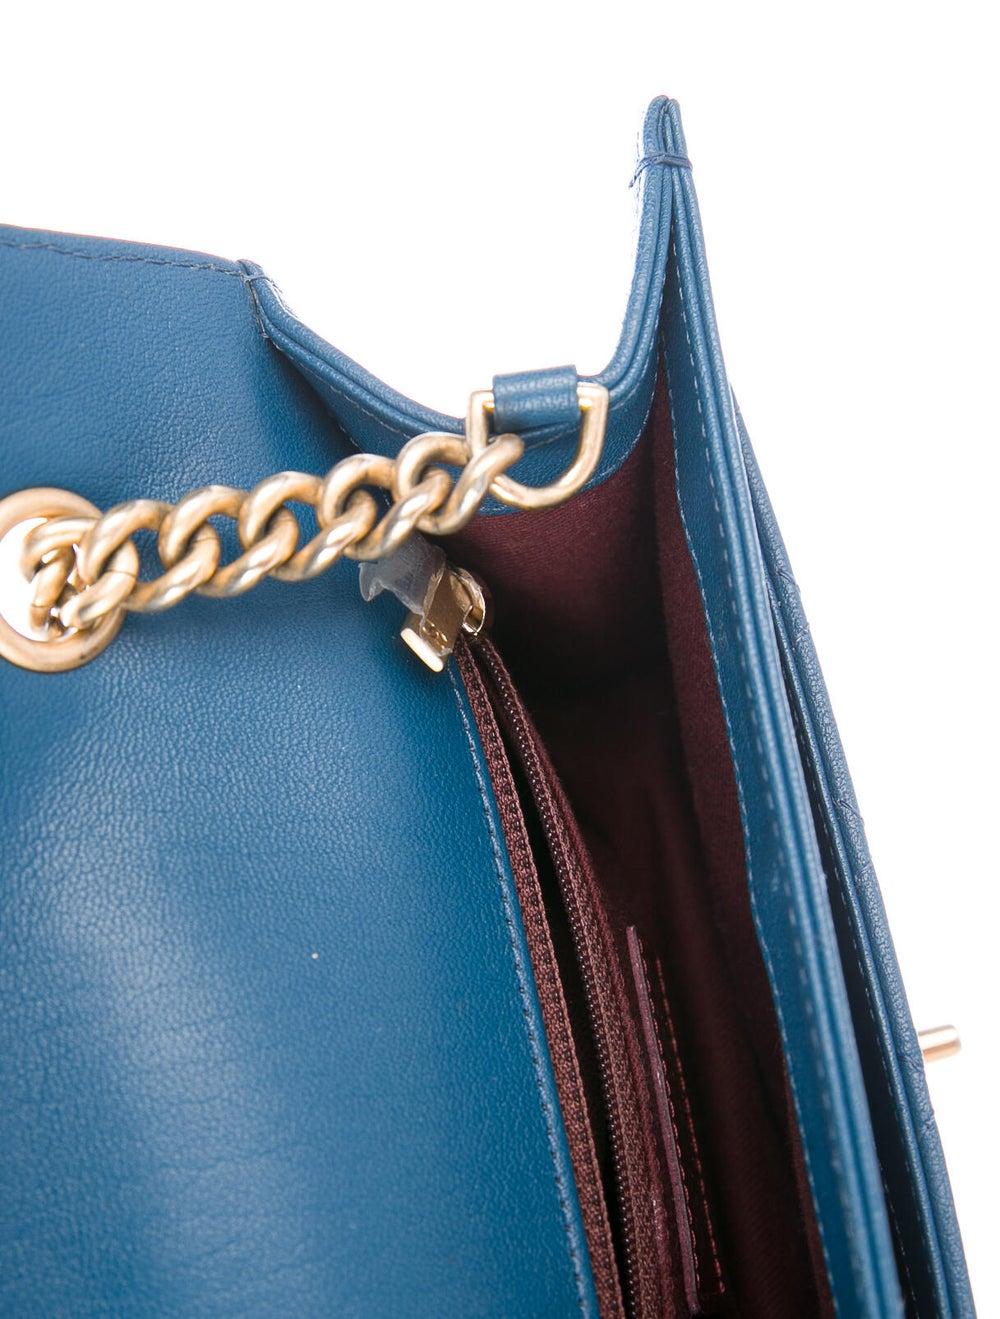 Chanel Front Chain Flap Bag Blue - image 5